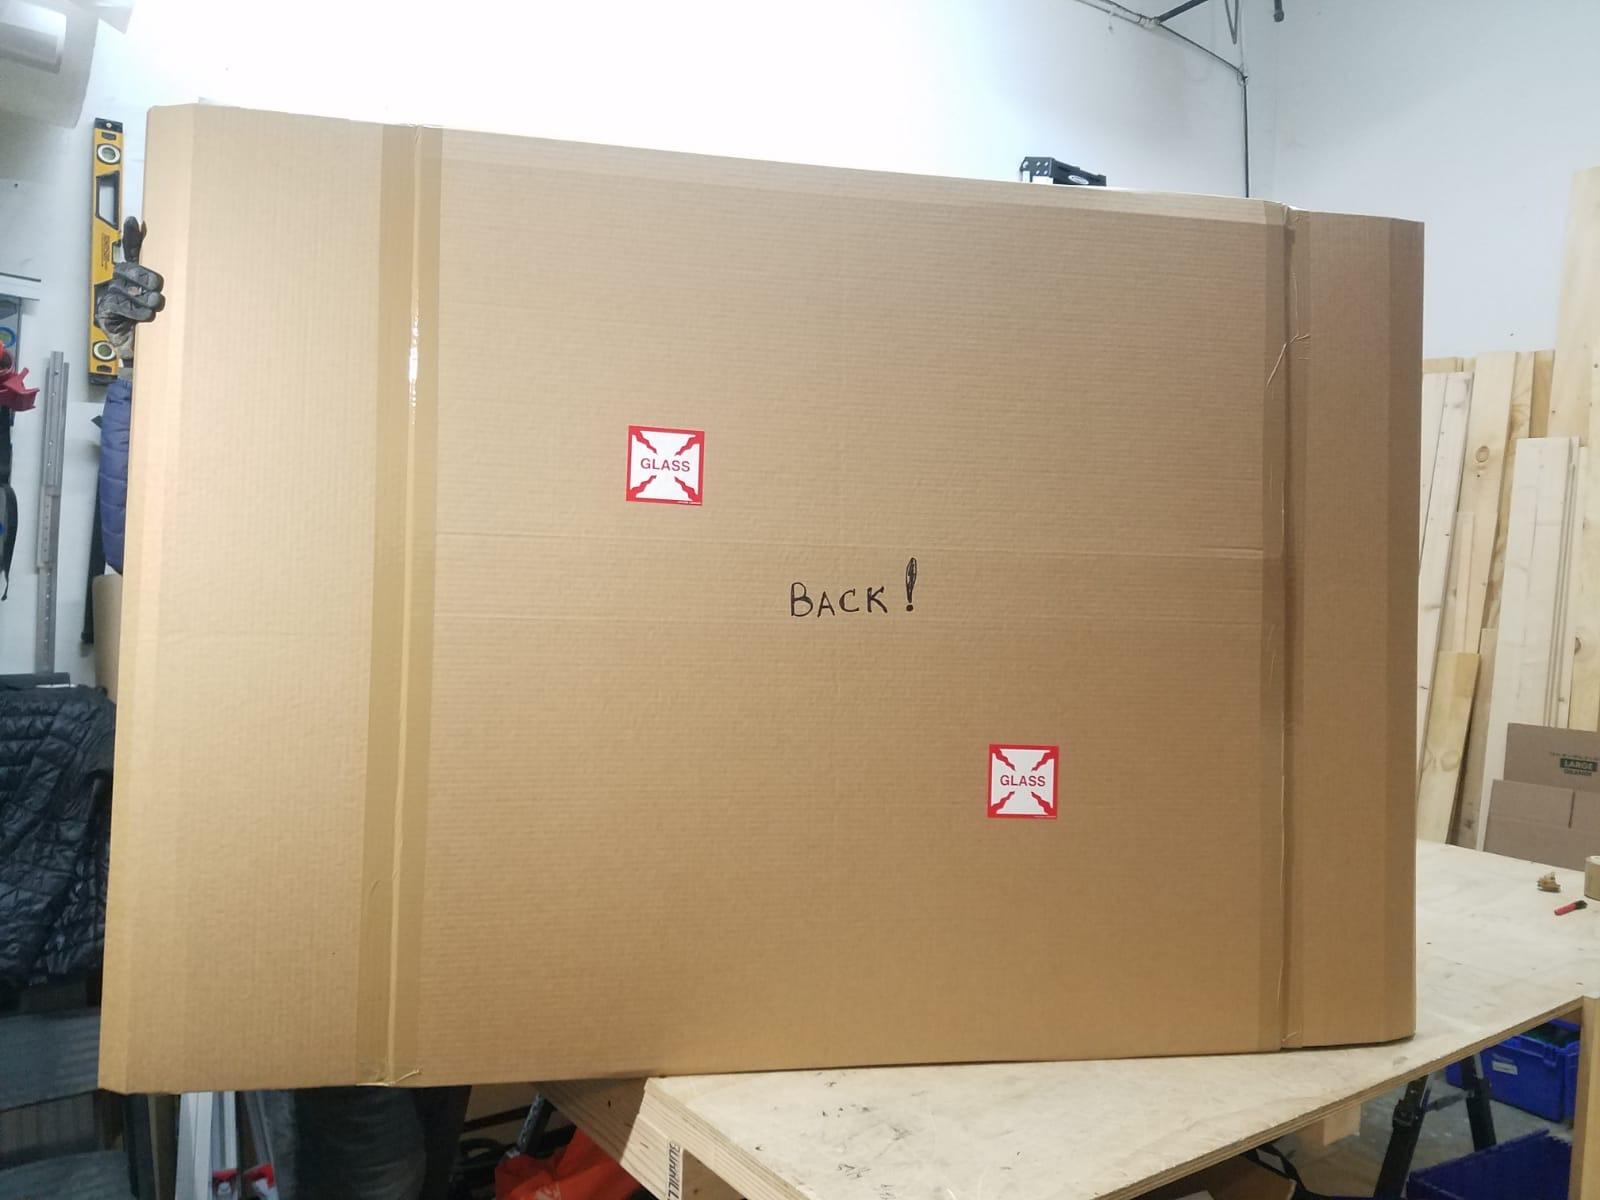 Fine art packing